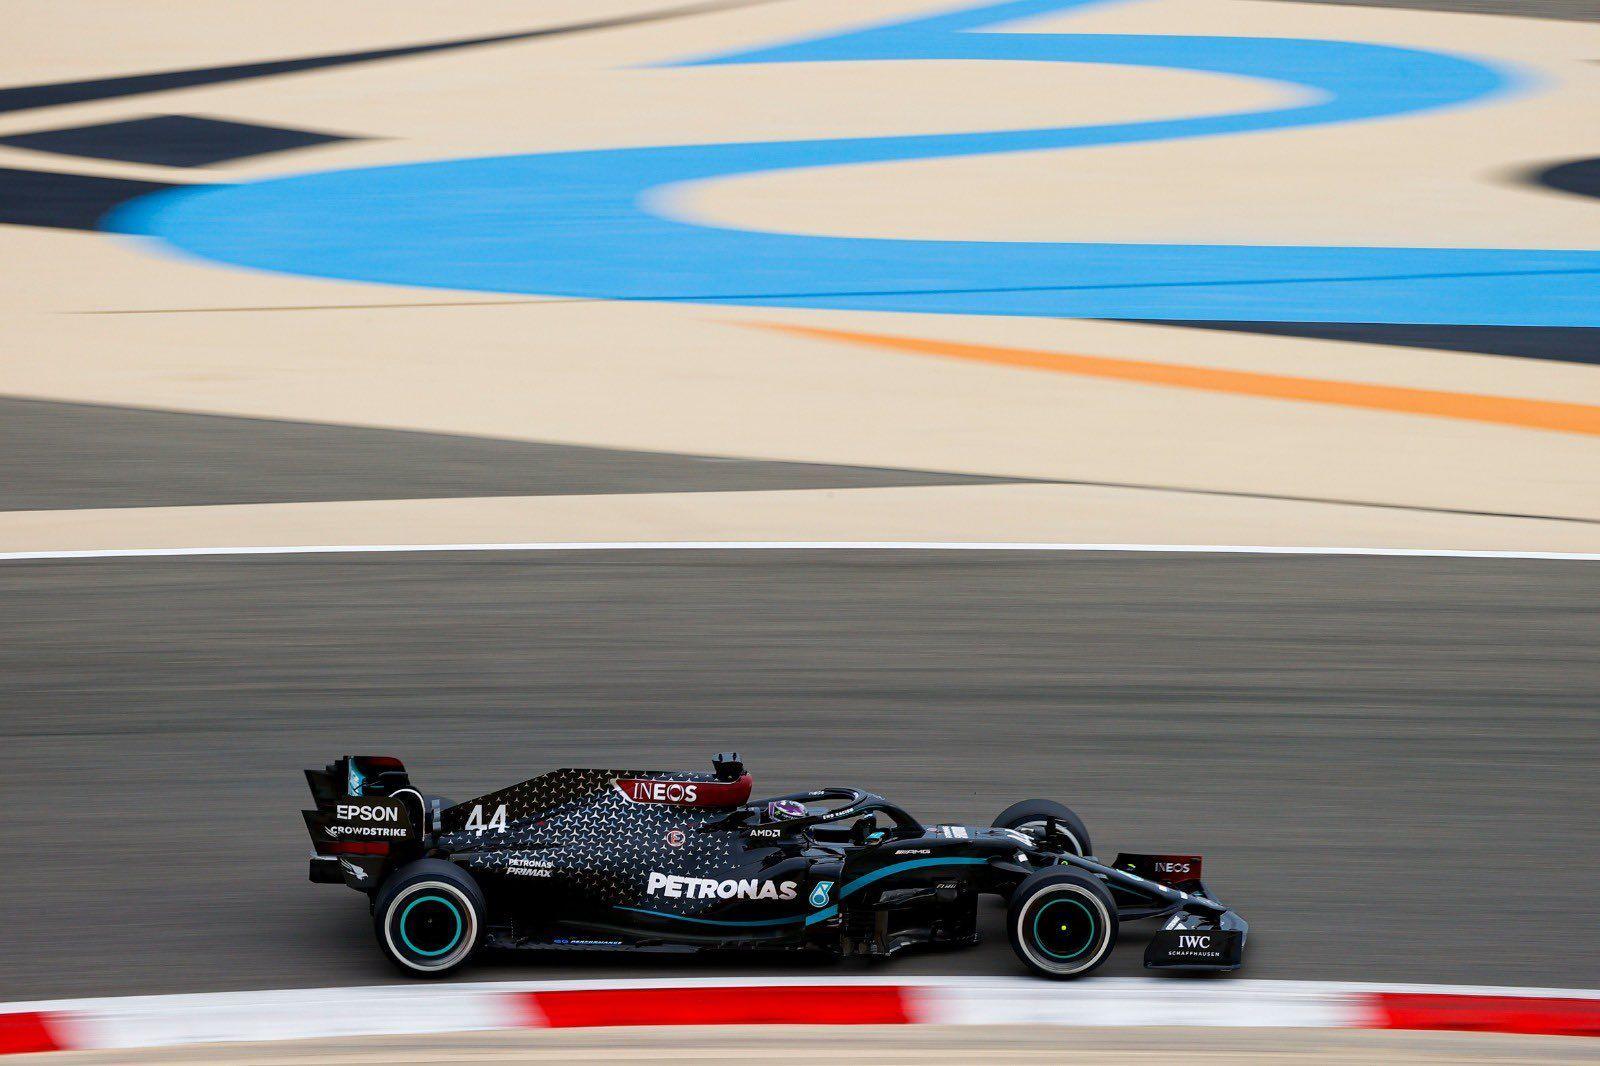 Bahrain GP, F1, Lewis Hamilton